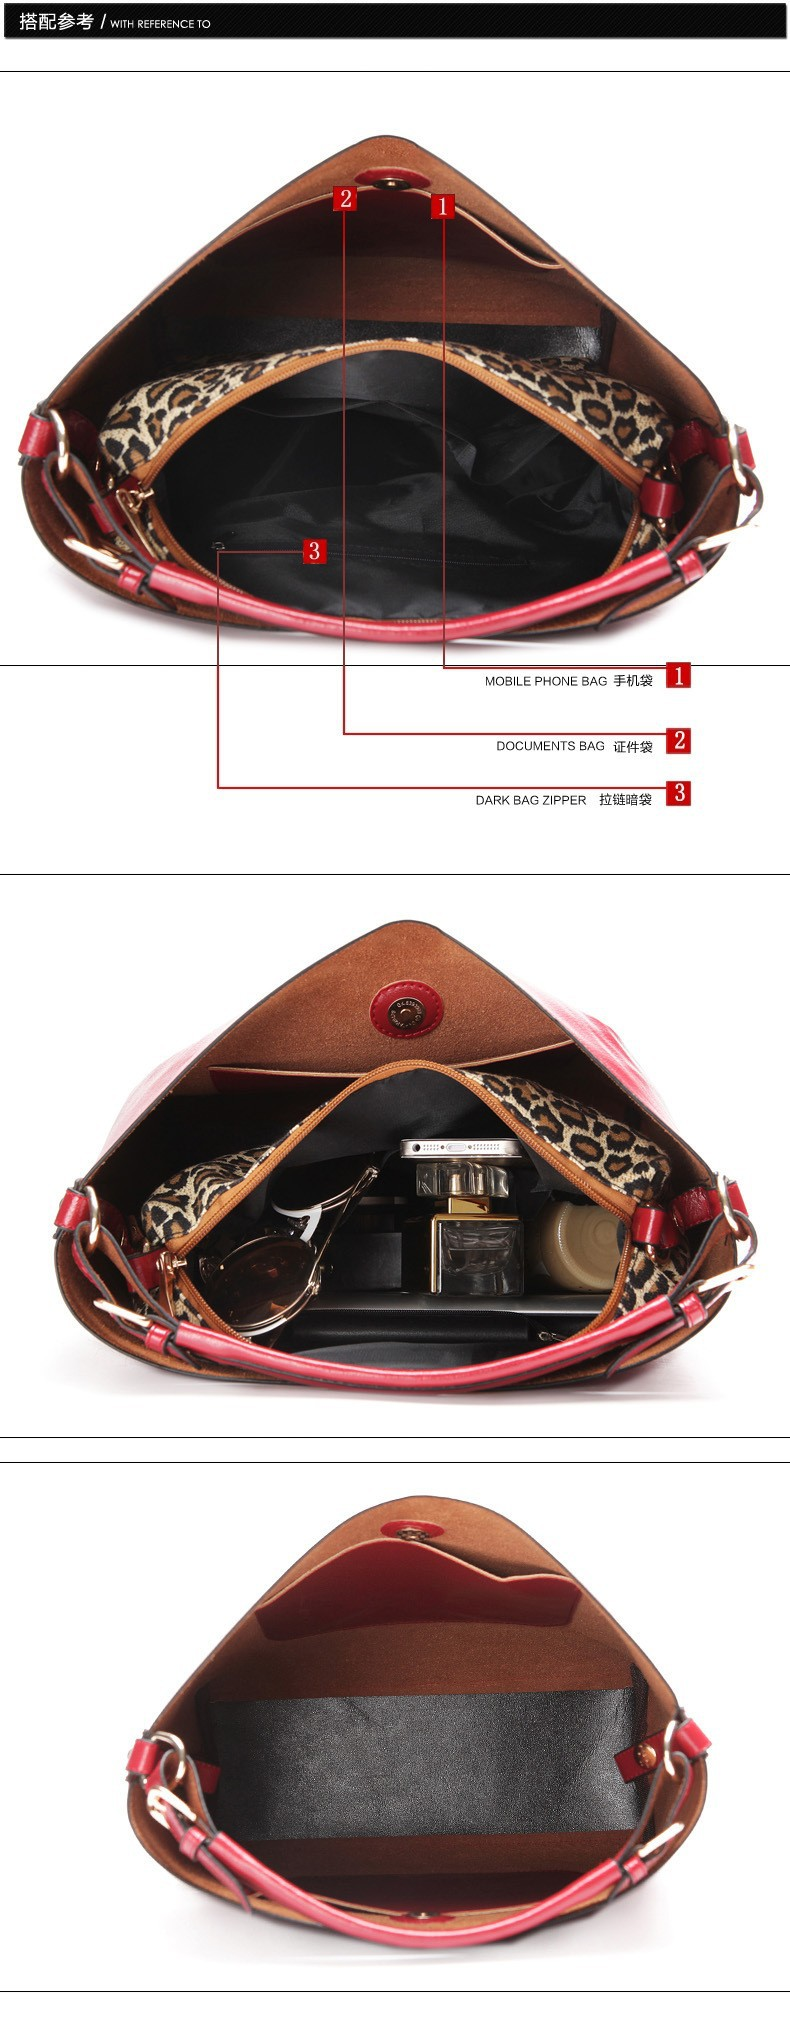 Ladies Composite Handbags Woman Fashion Pu Leather Bags Crossbody Bag For Women Fashion 2015 Designer High Quality Bags BH270 (18)